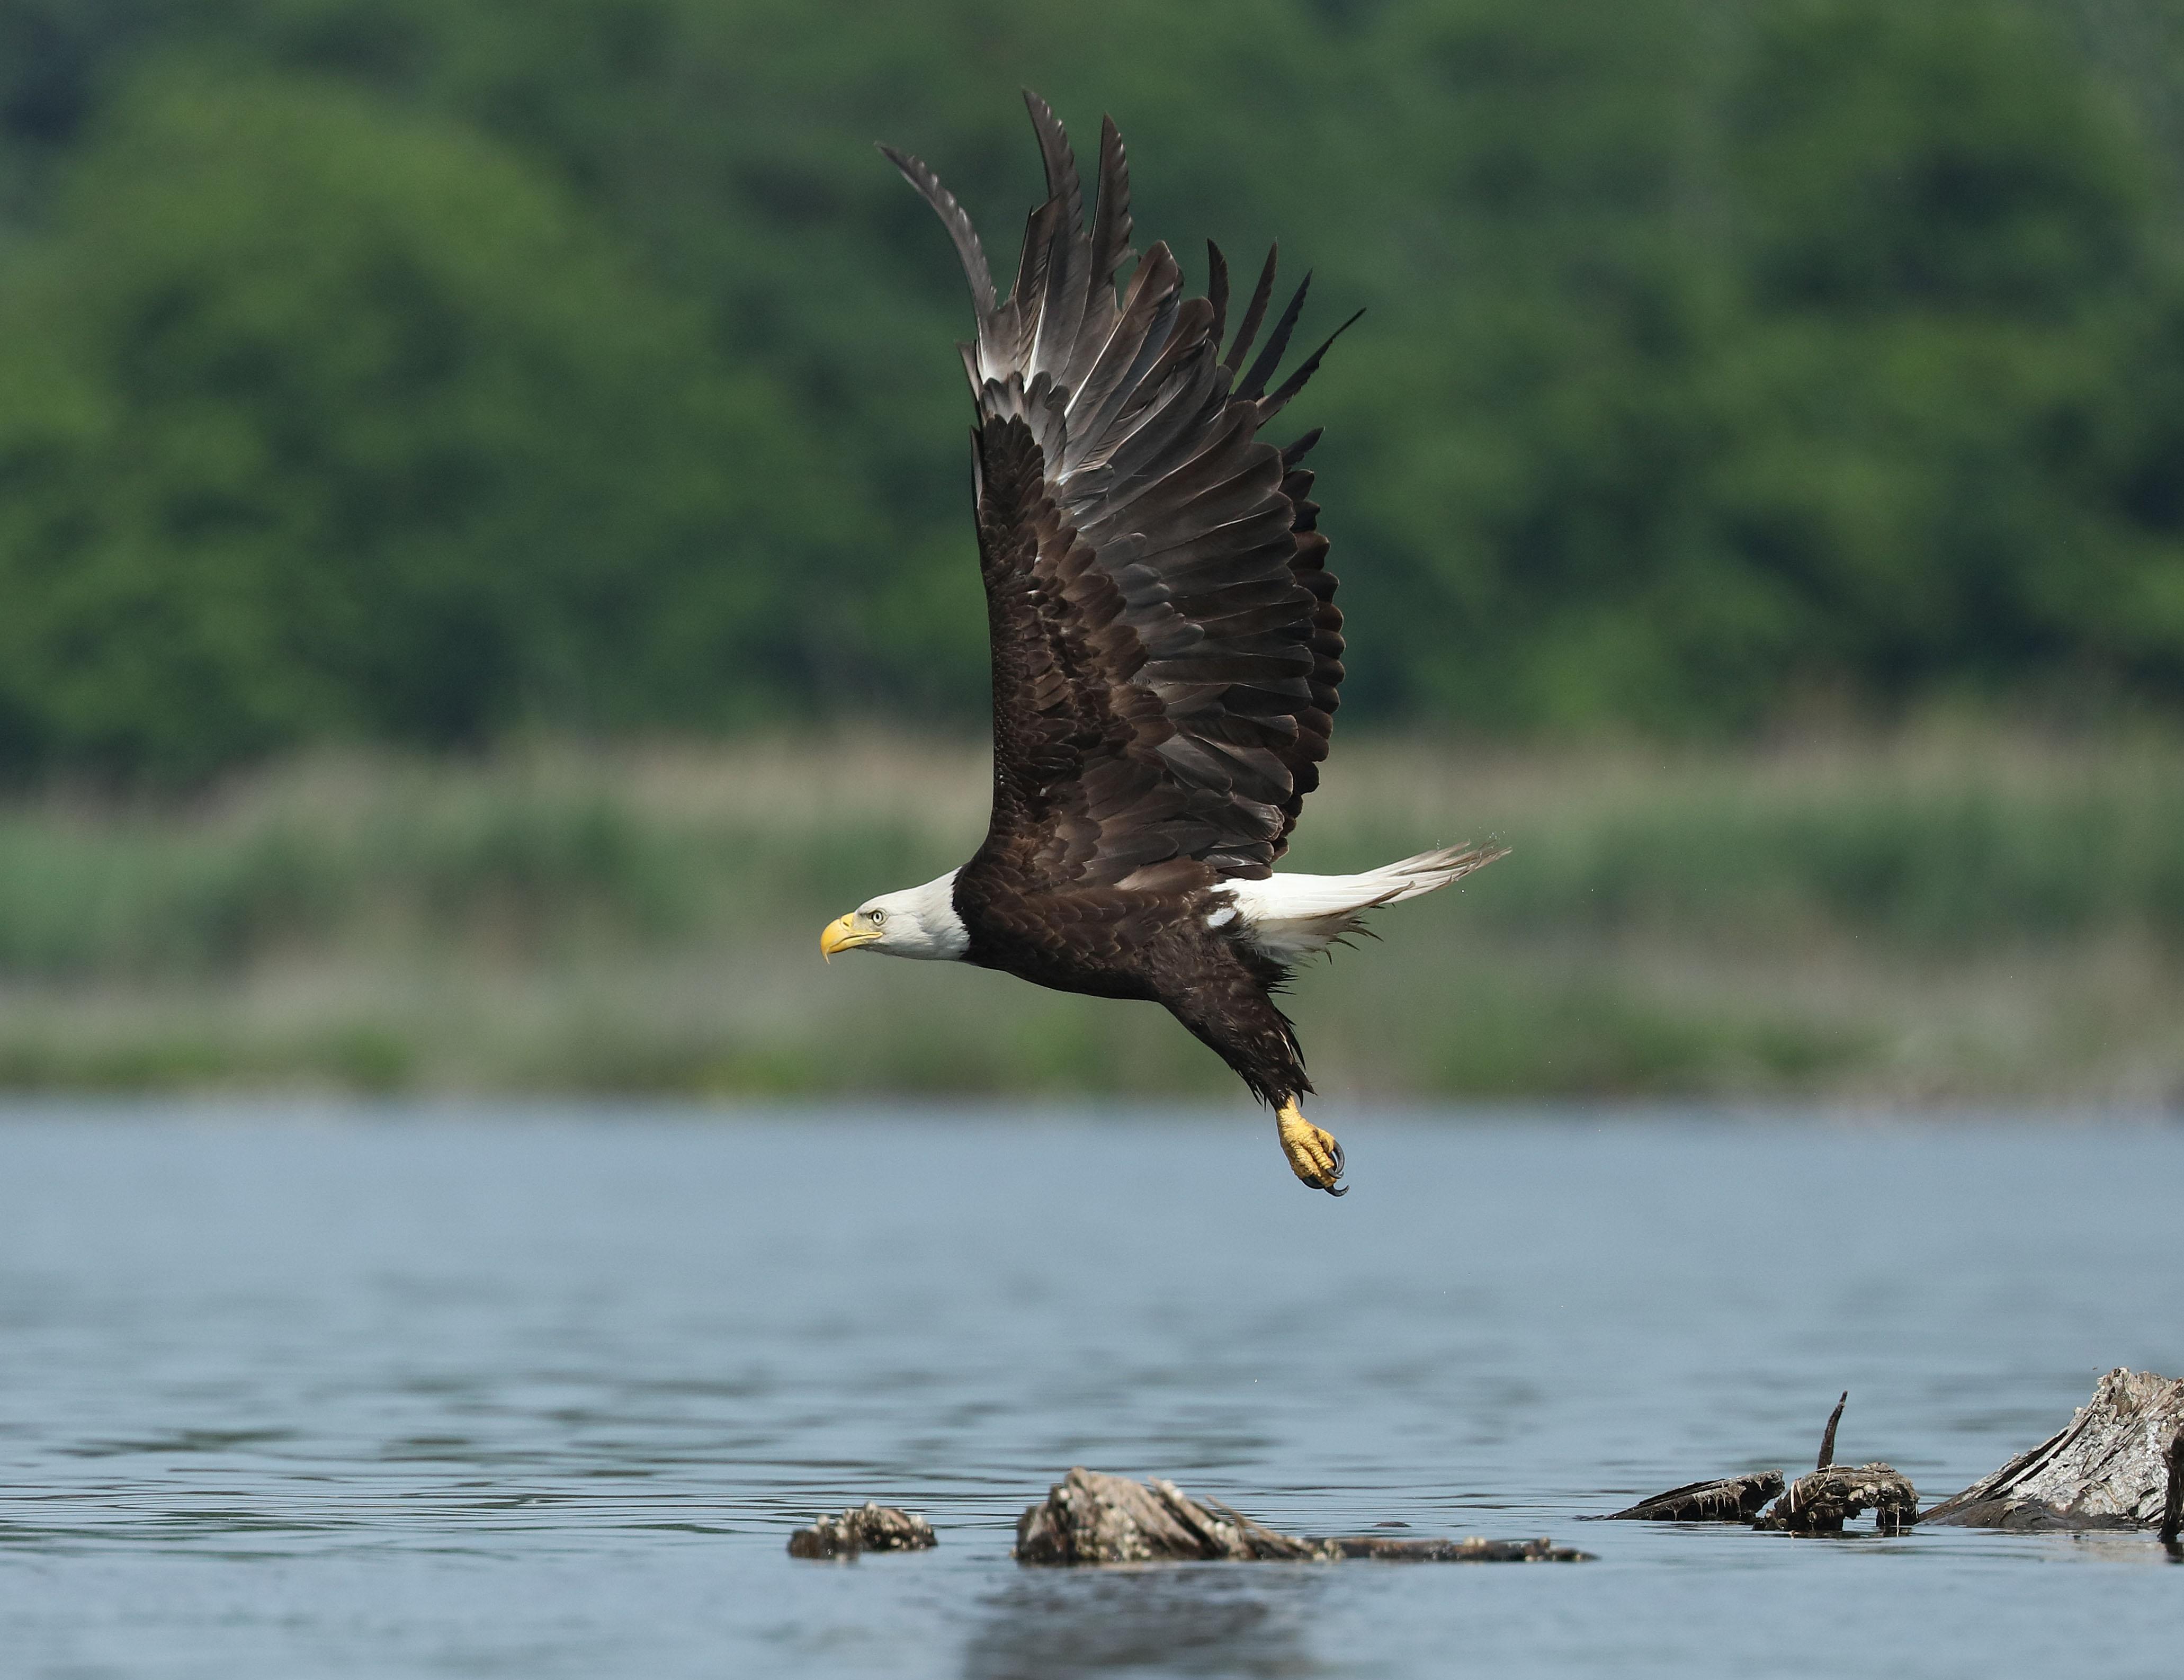 bald-eagle2-kearny-marsh-ron-shields-6-16